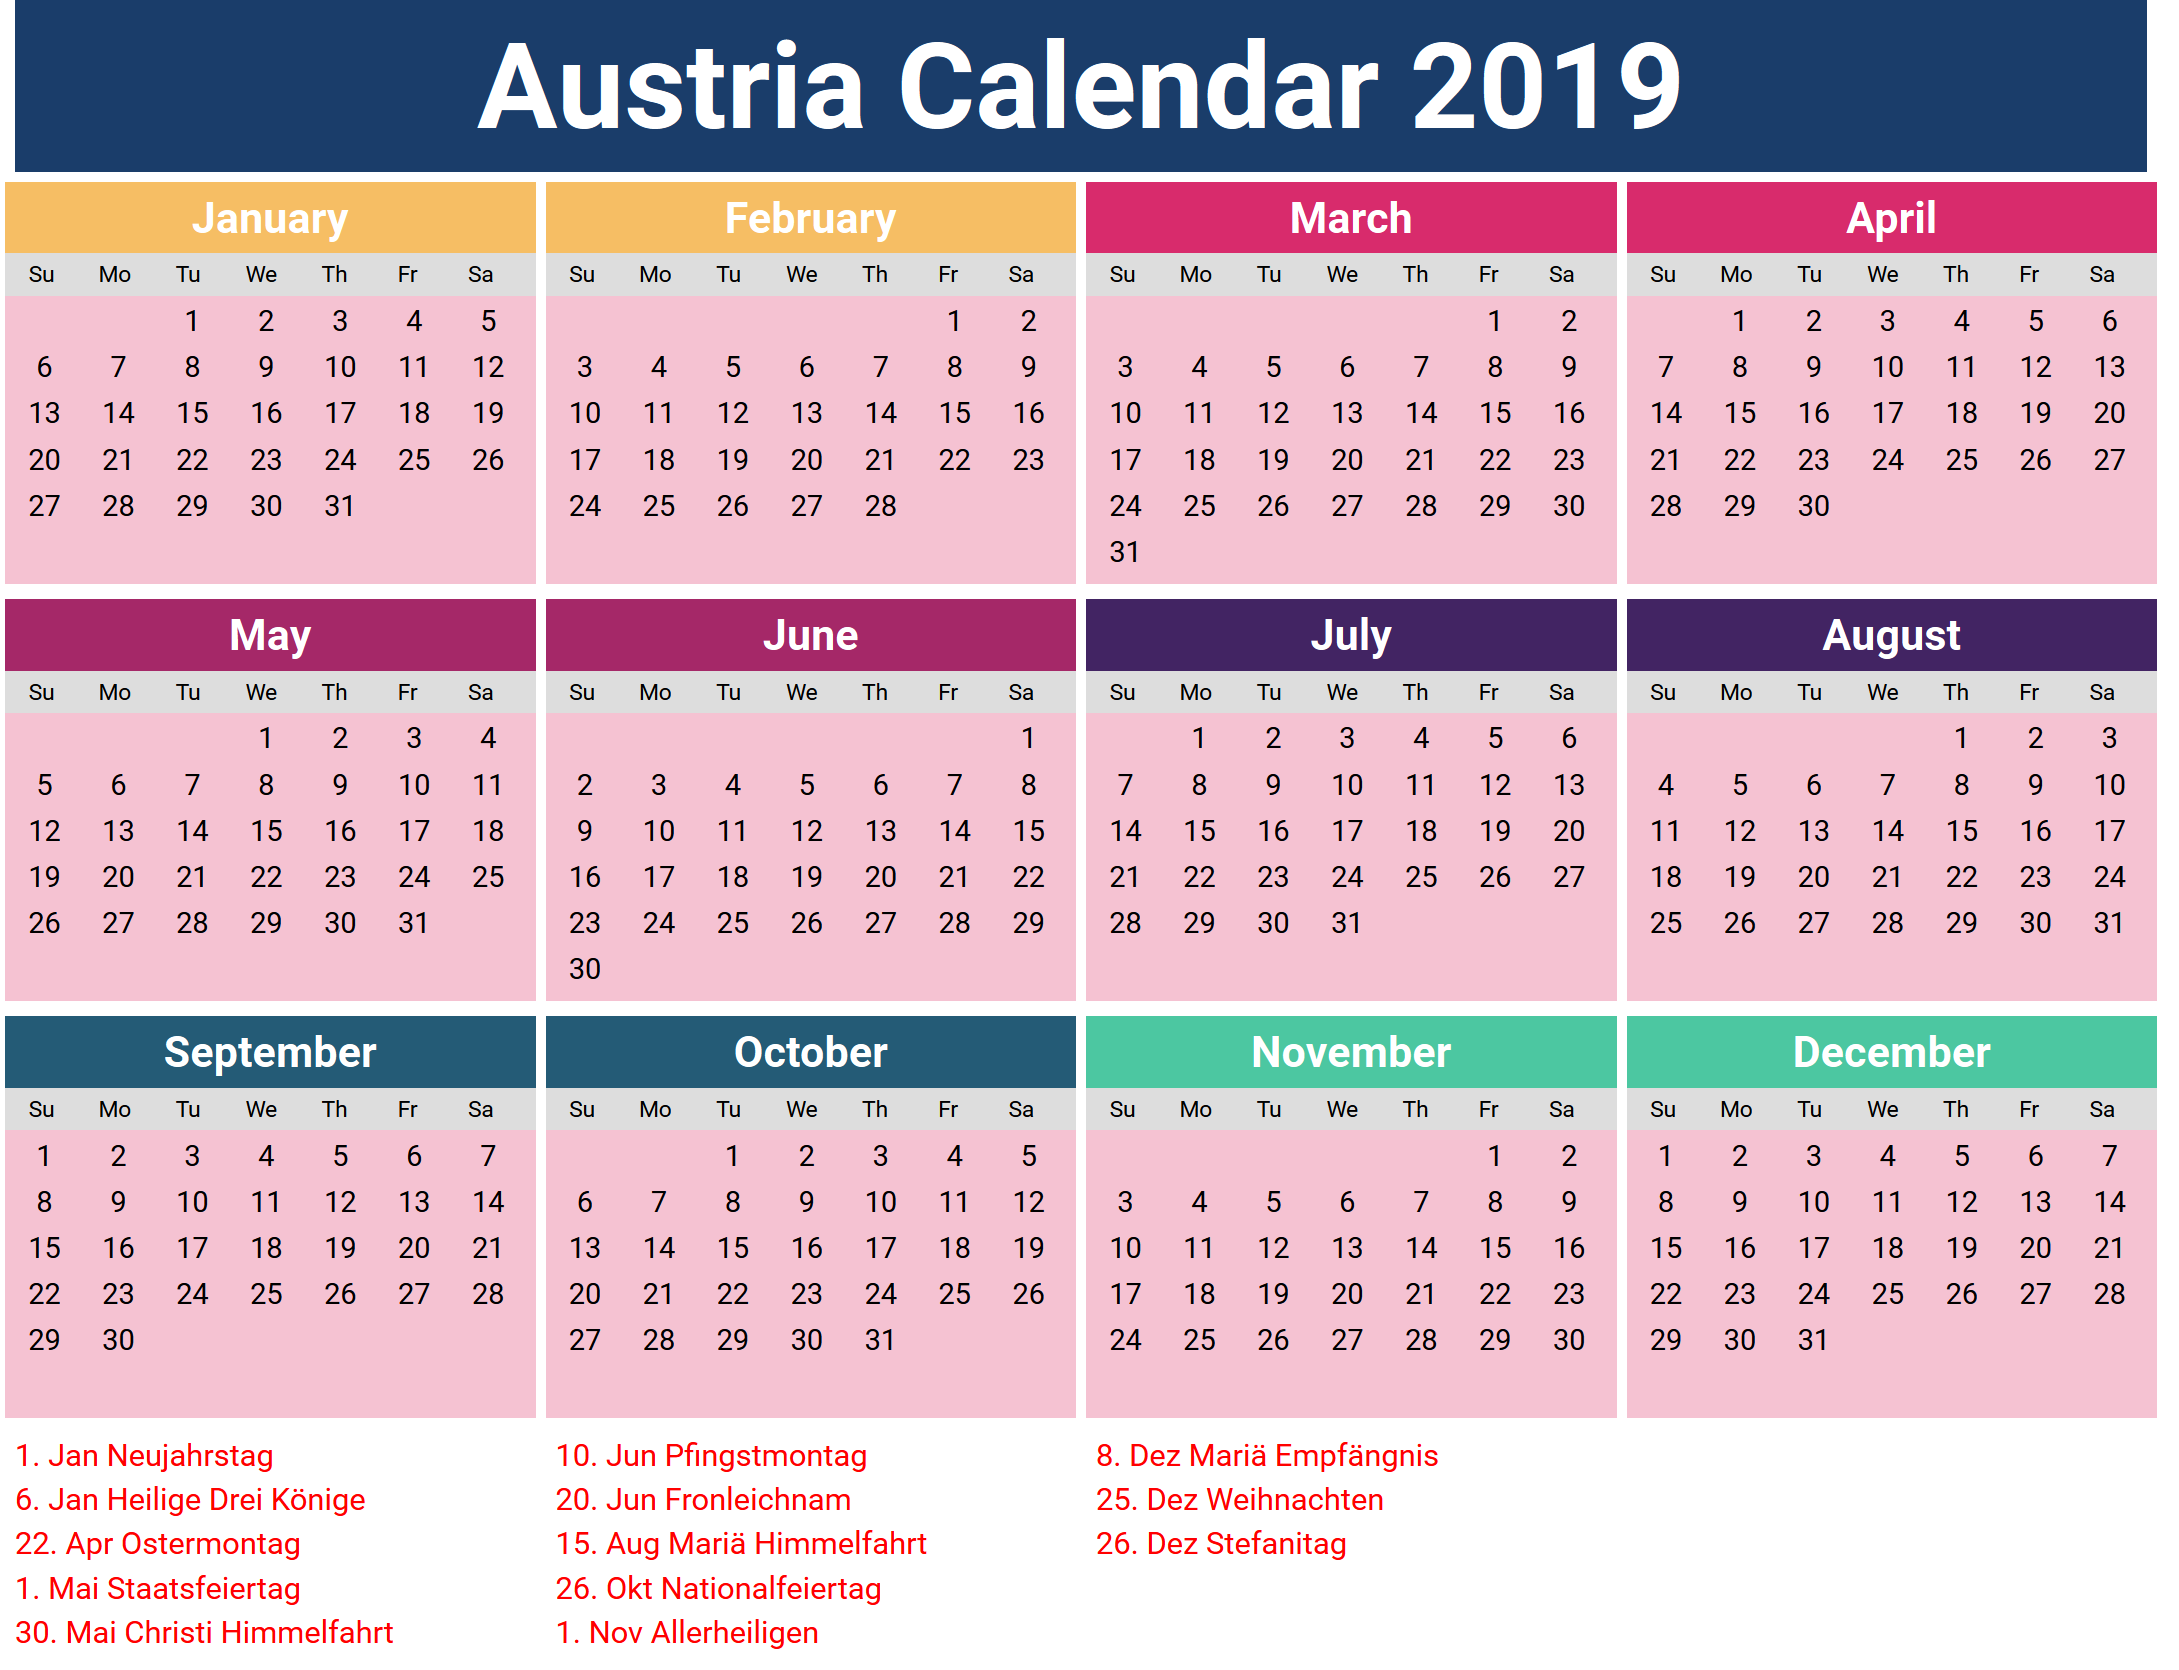 Printable Calendar 2019 with Austria Holidays